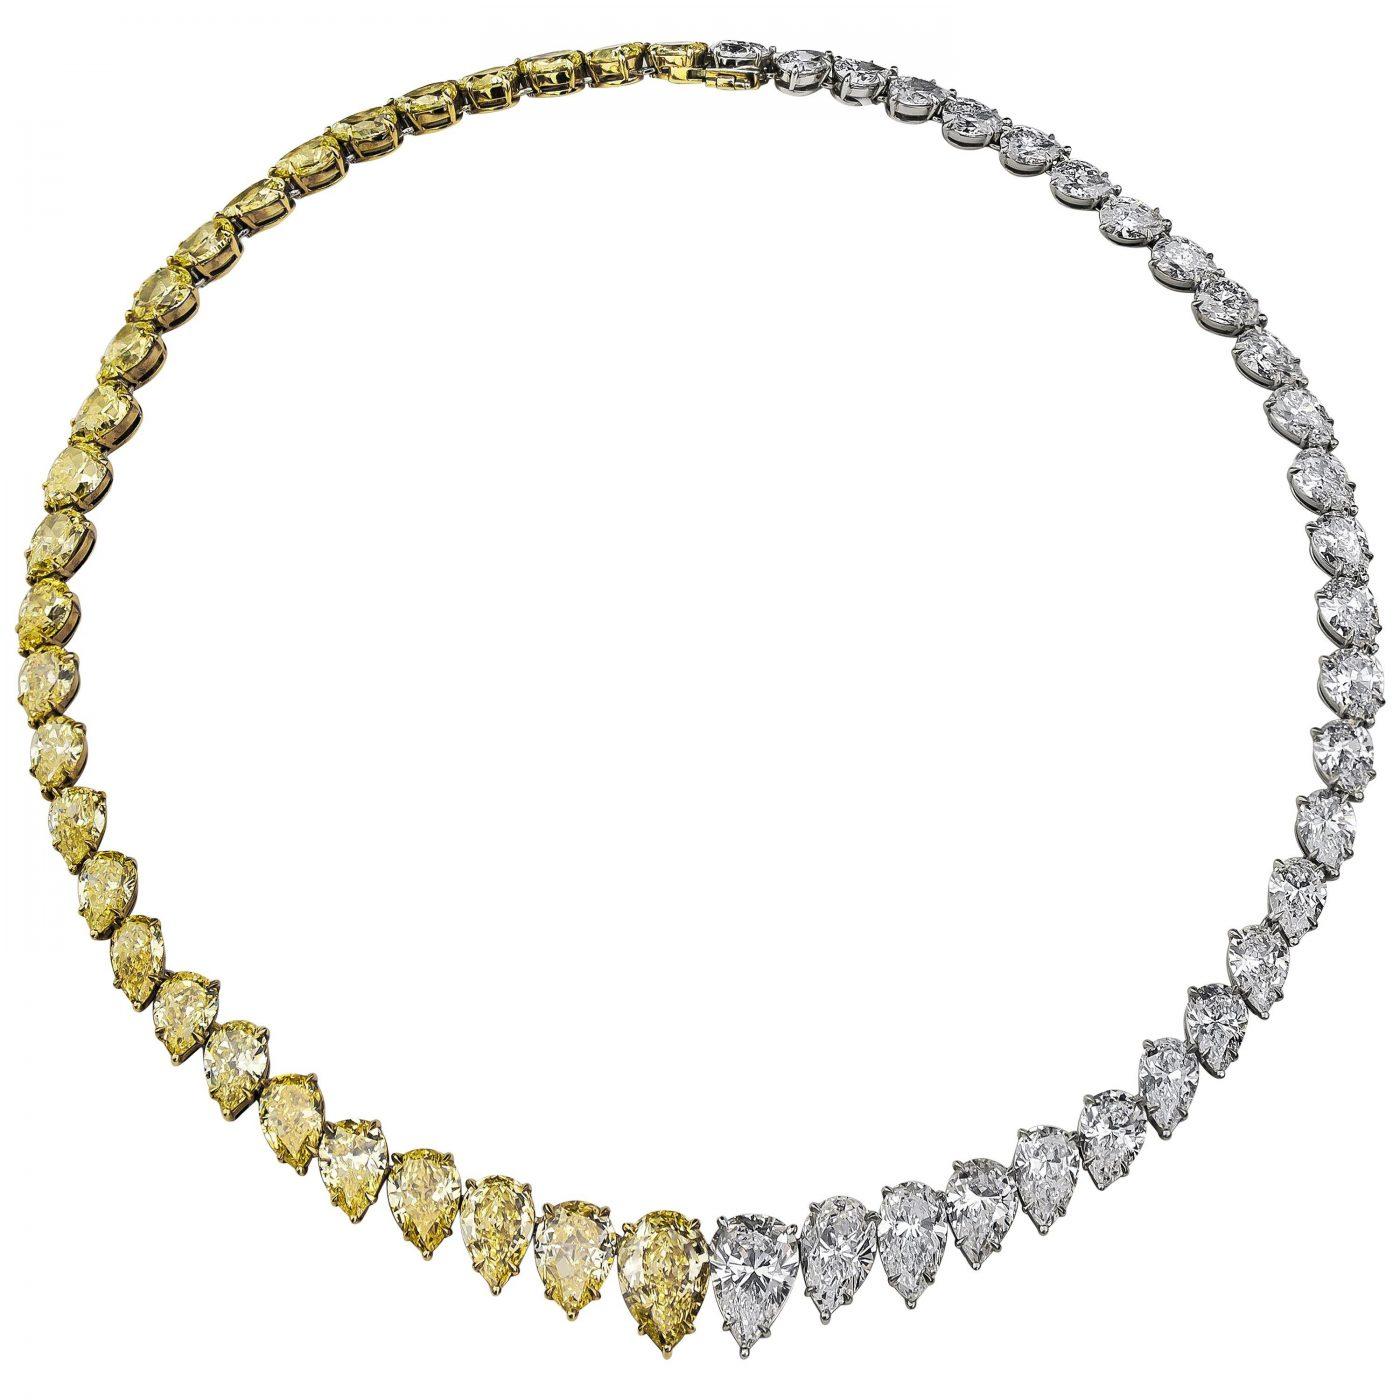 Roman Malakov 61.96 Carat Graduating Yellow and White Diamond Rivière Necklace